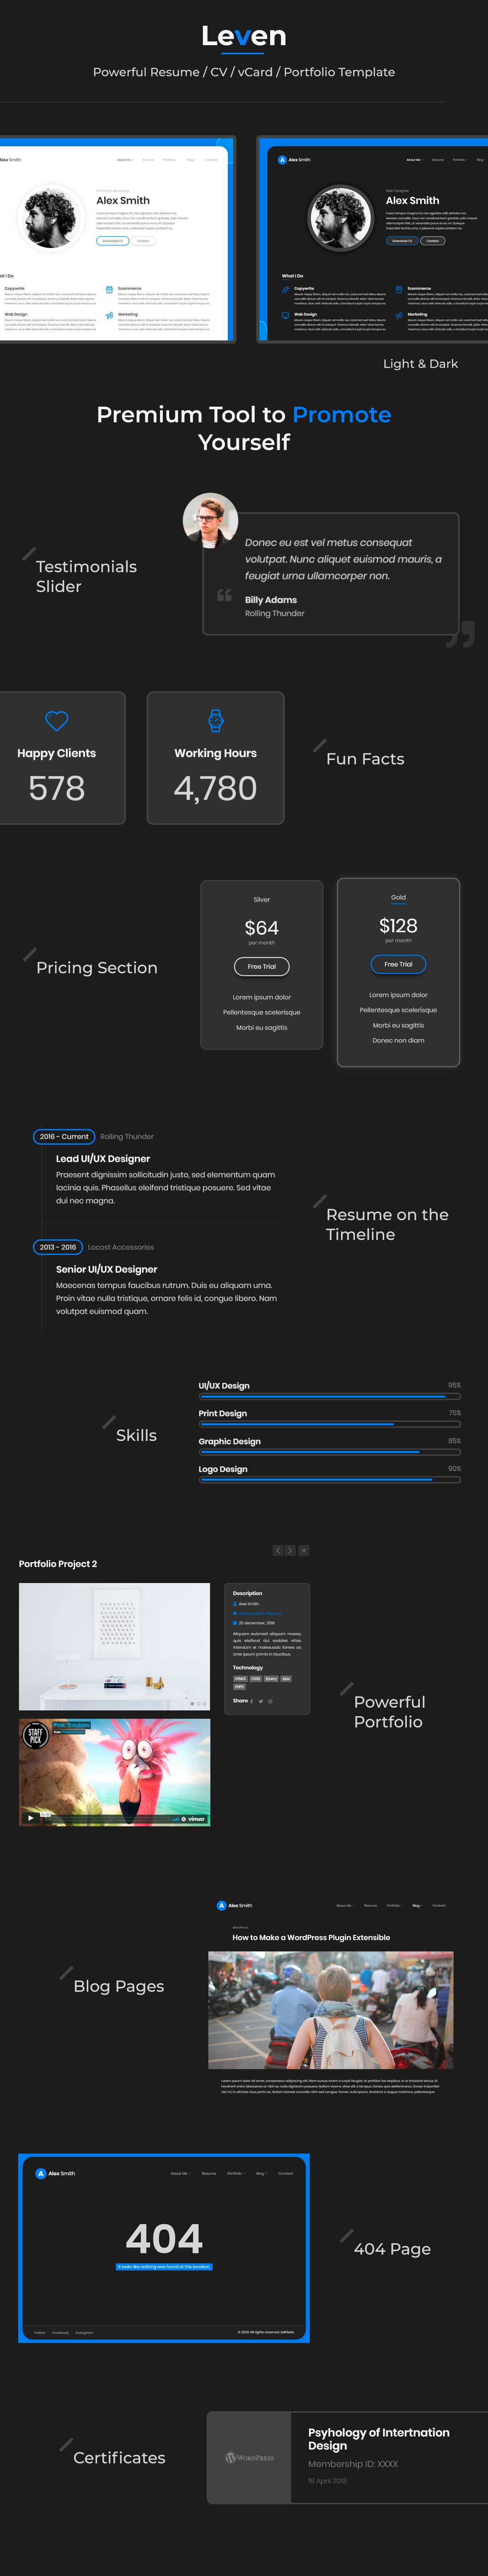 Leven | CV Resume Template - 4